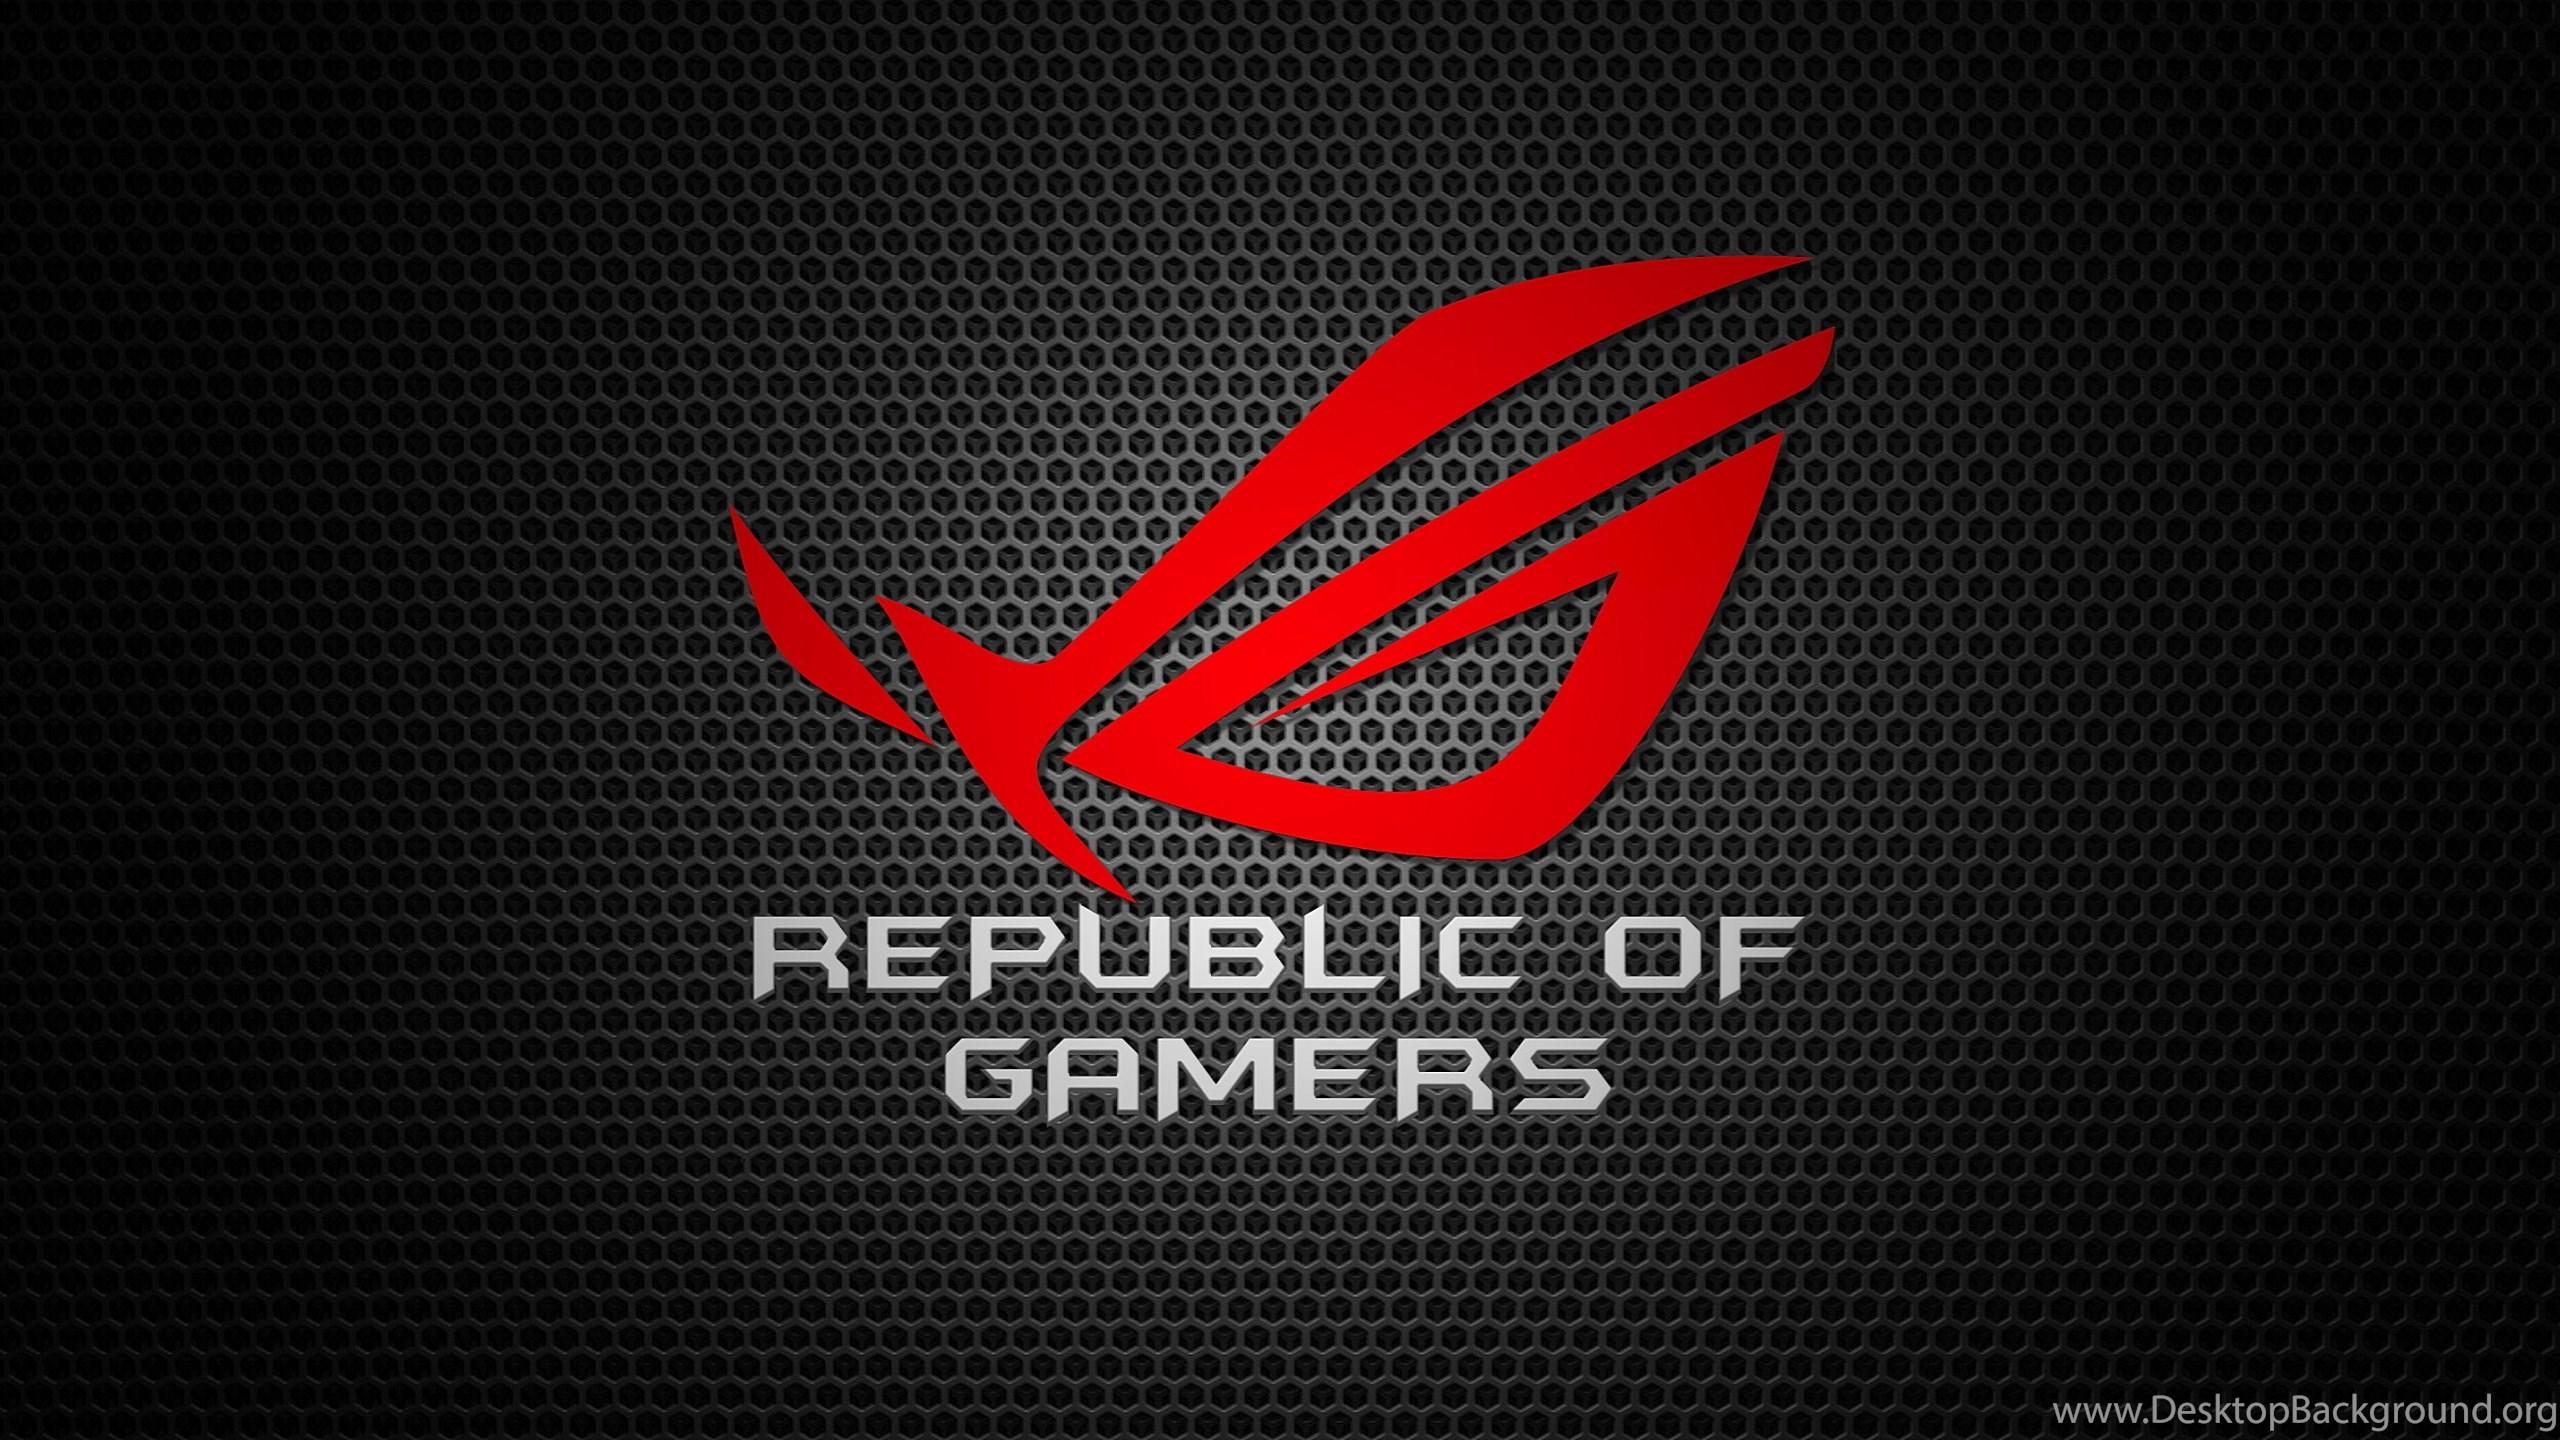 Nvidia Wallpaper - Republic Of Gamers , HD Wallpaper & Backgrounds